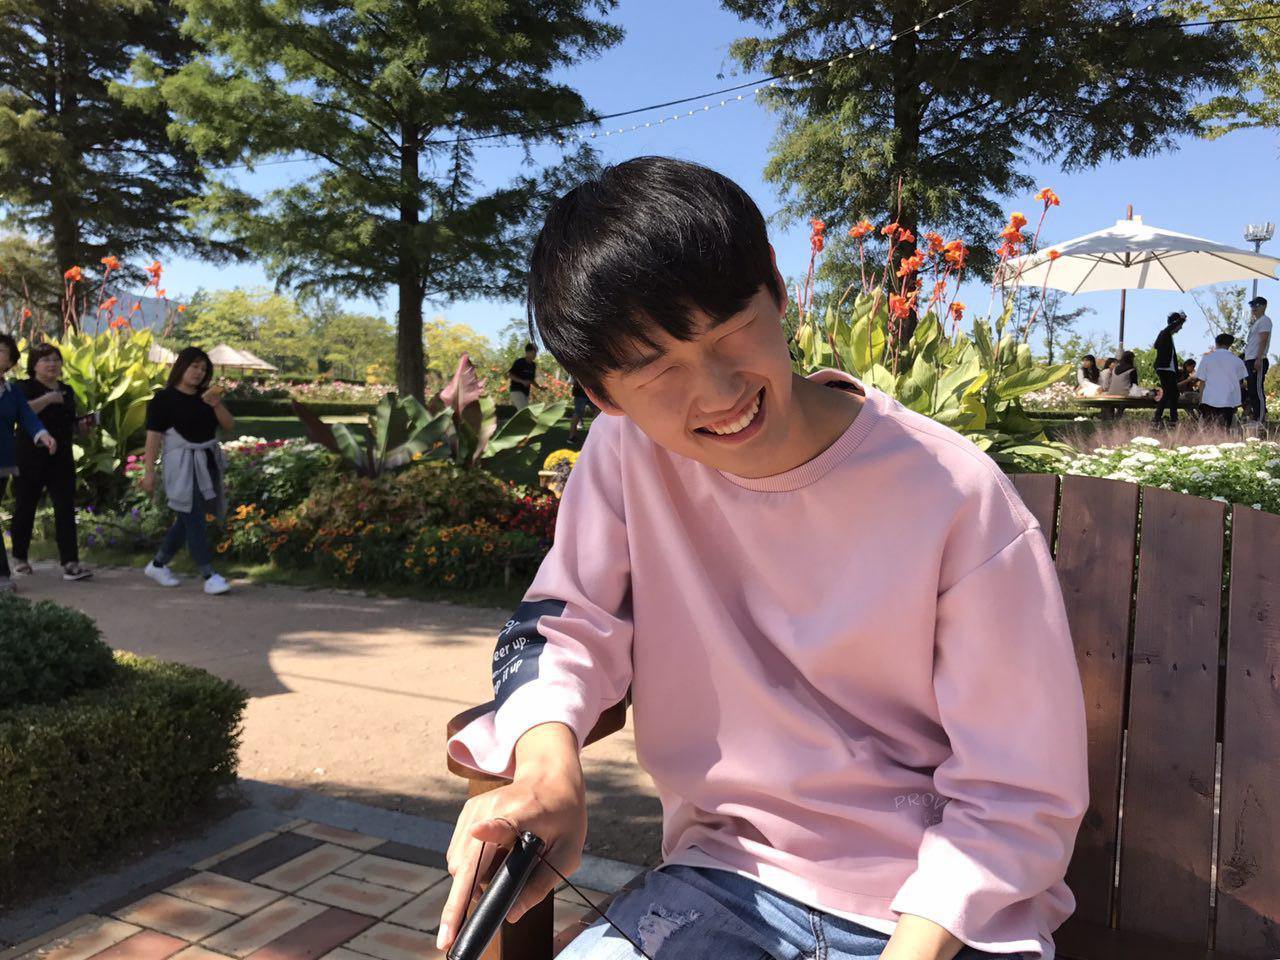 photo_2017-09-24_16-57-56.jpg